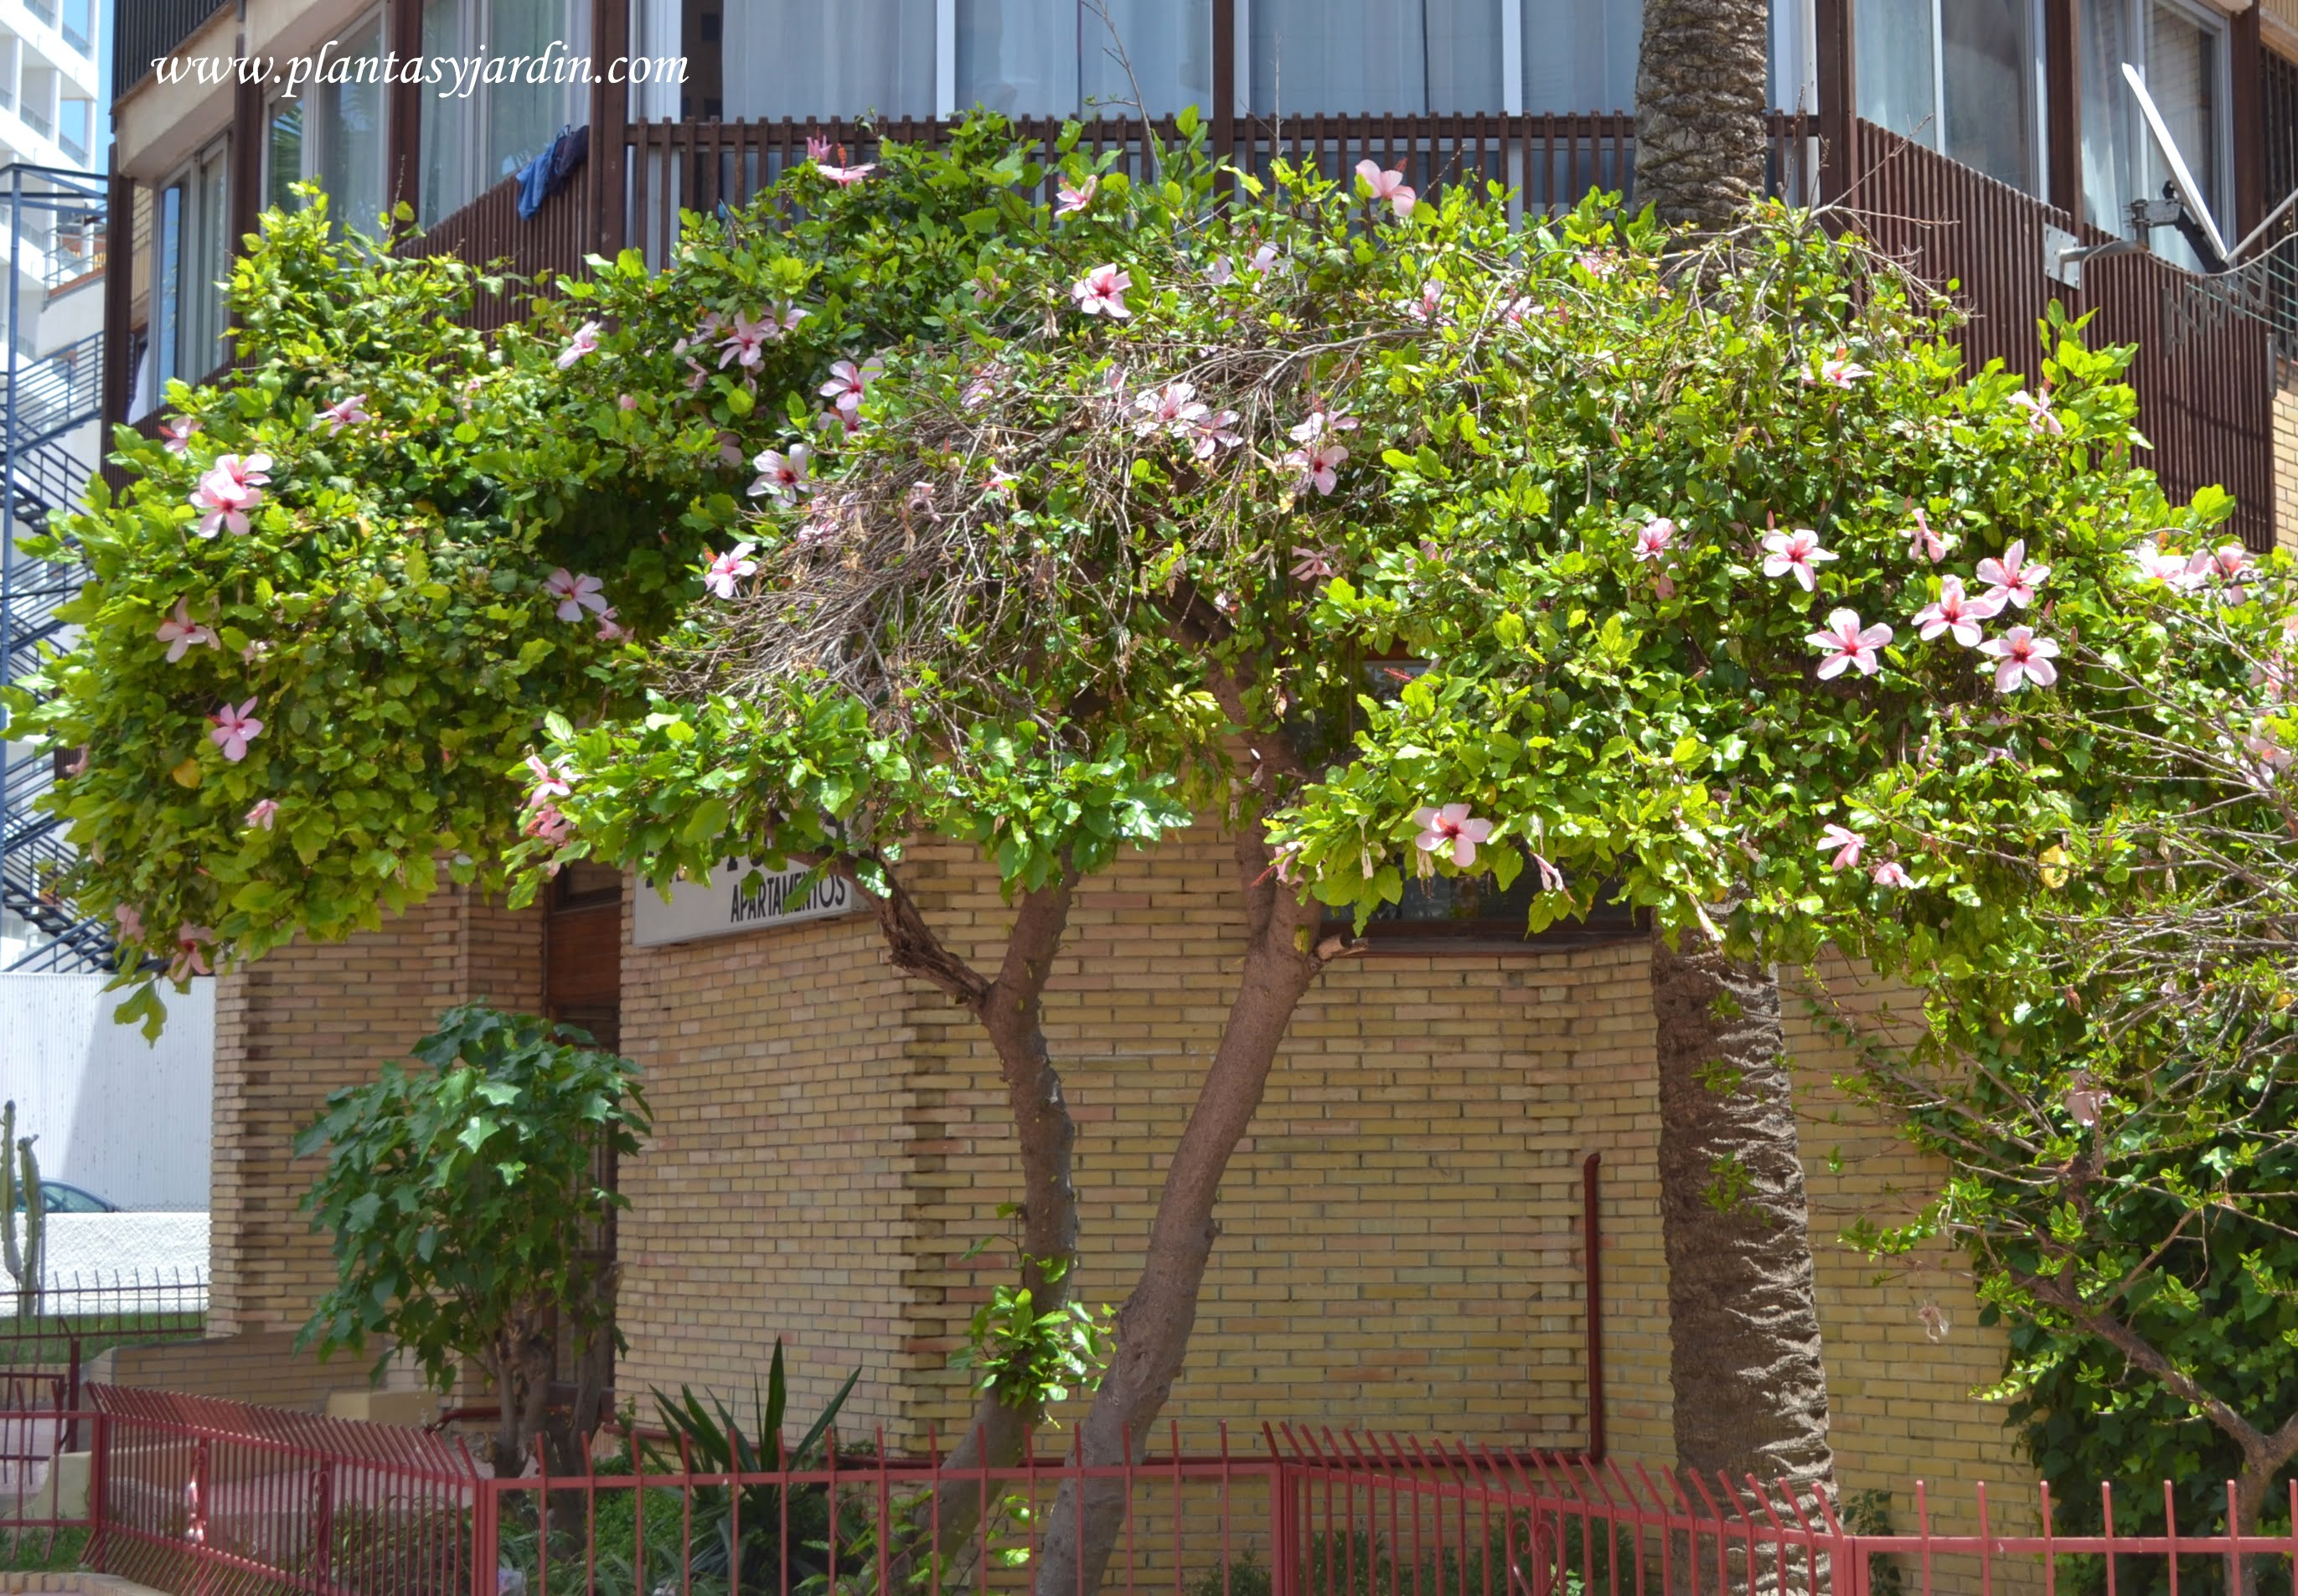 Arboles para jardin que den sombra beautiful arboles para for Arboles para jardin